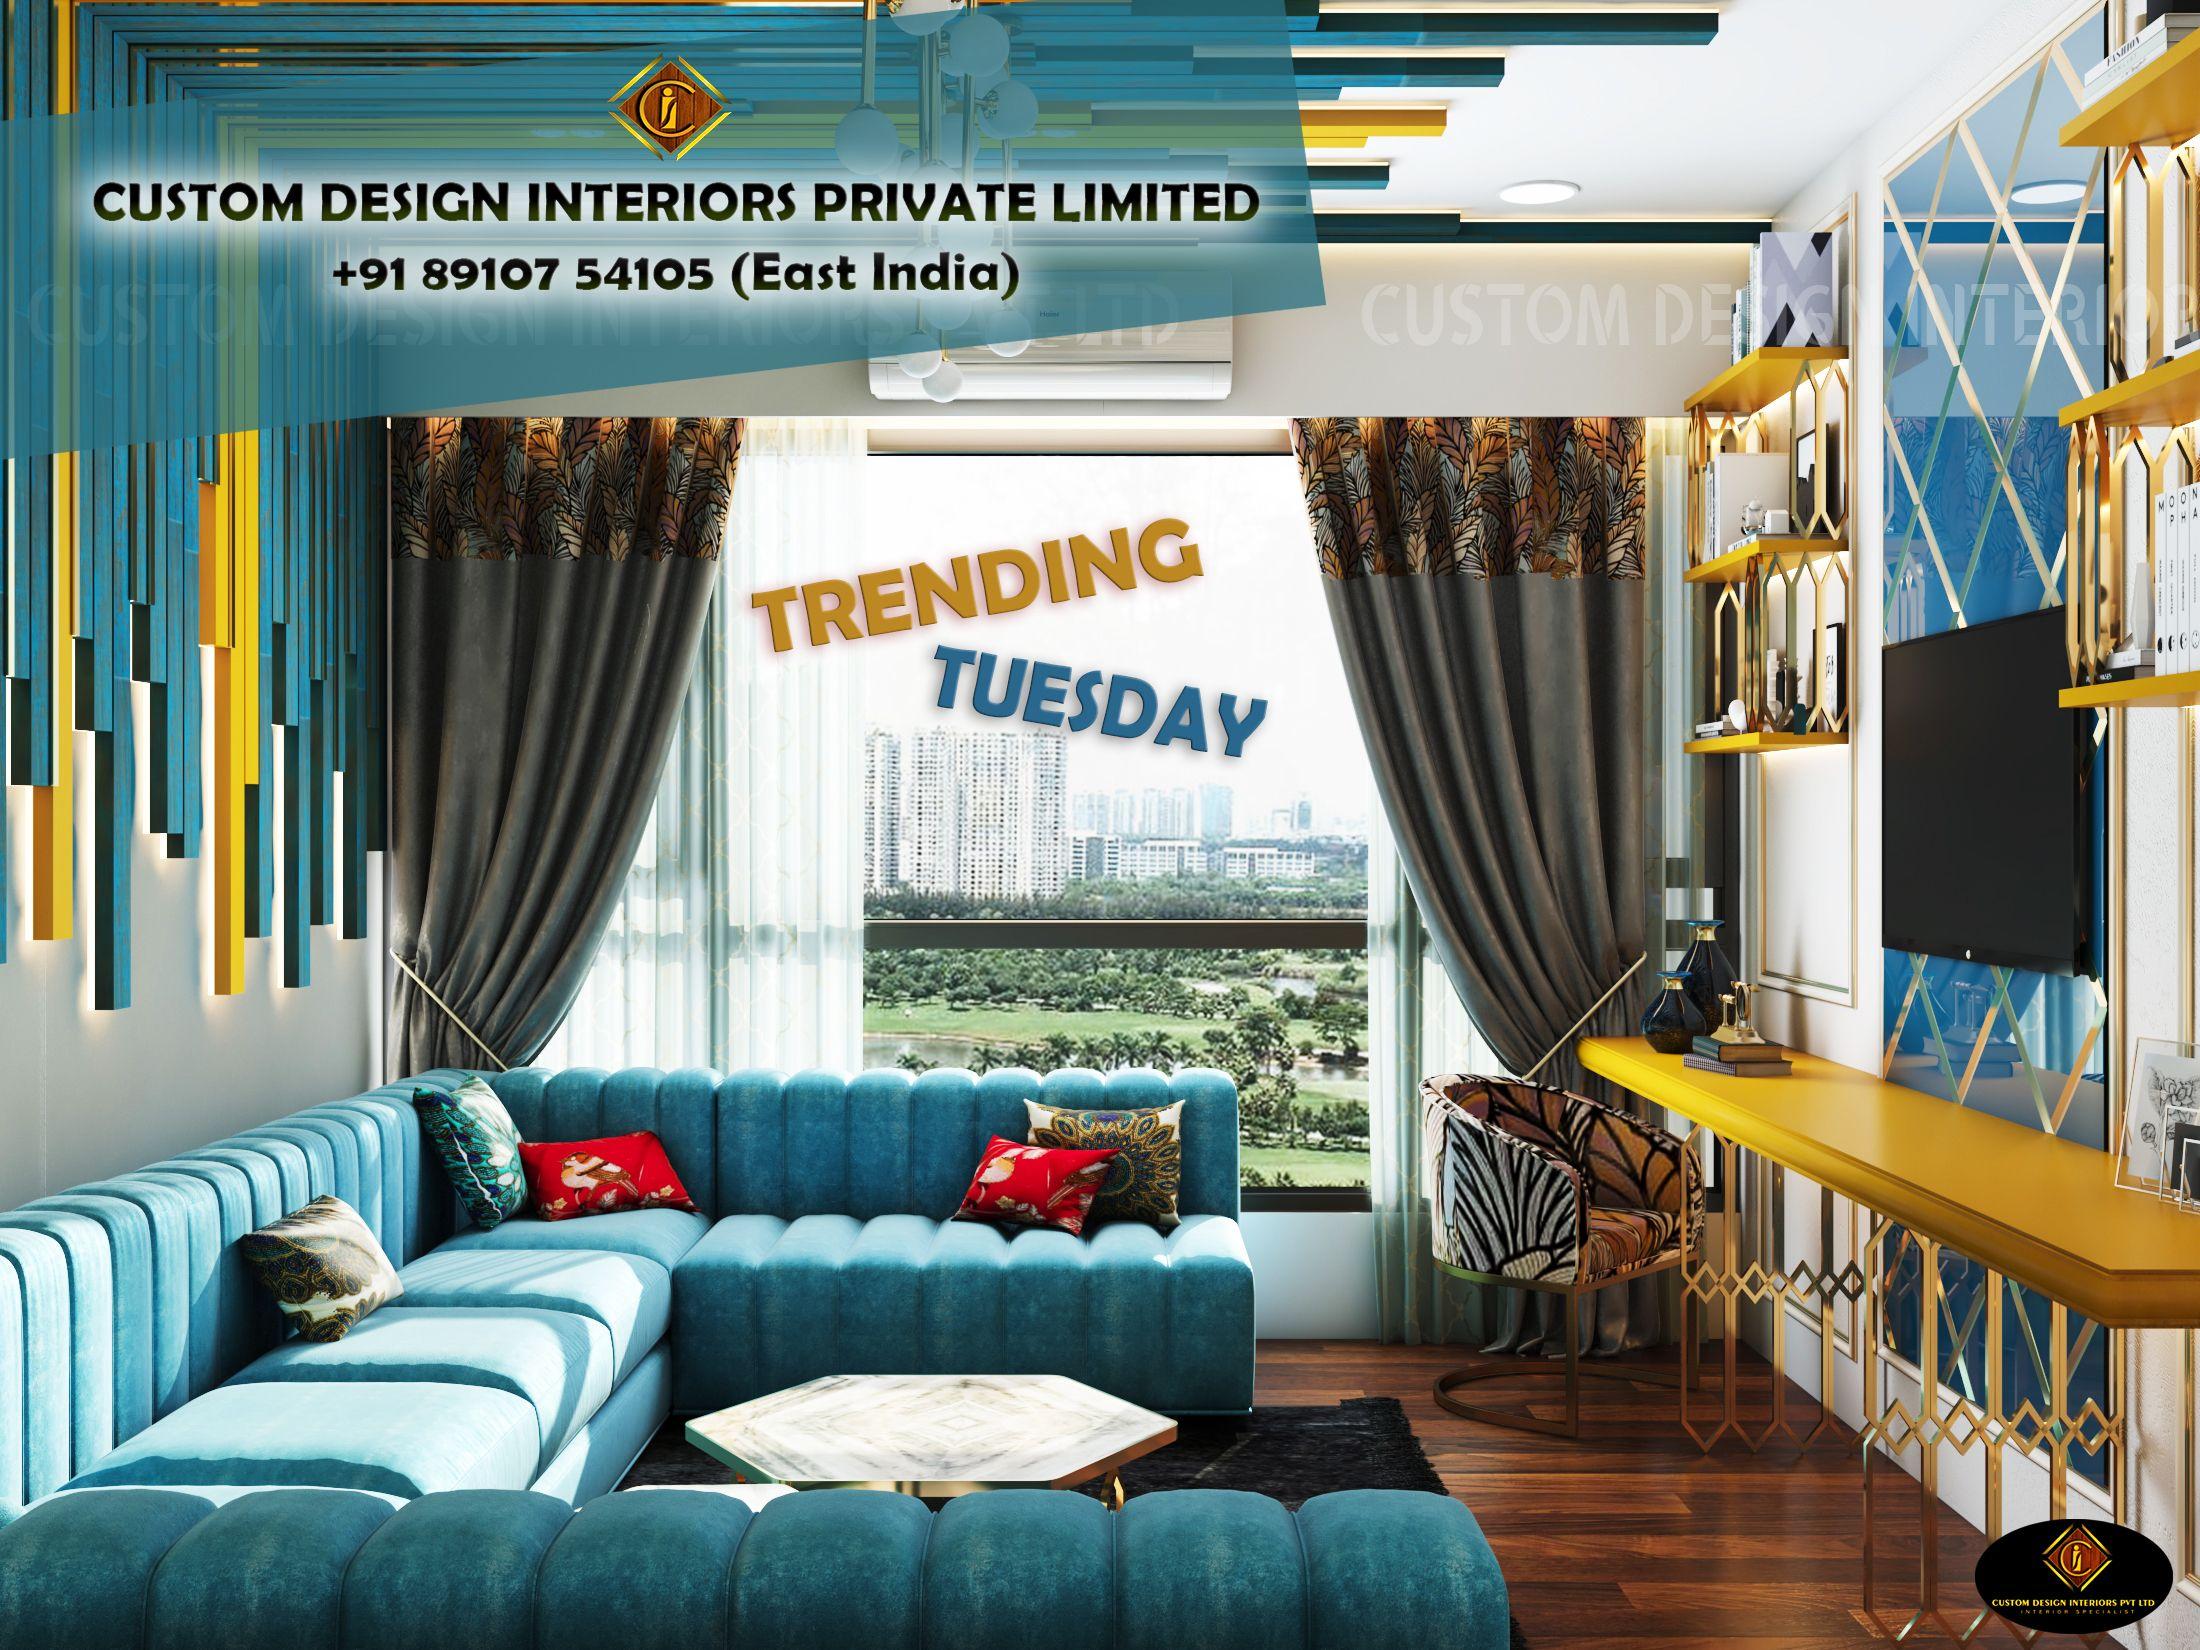 Trending Tuesday Custom Design Interiors Pvt Ltd The Interior